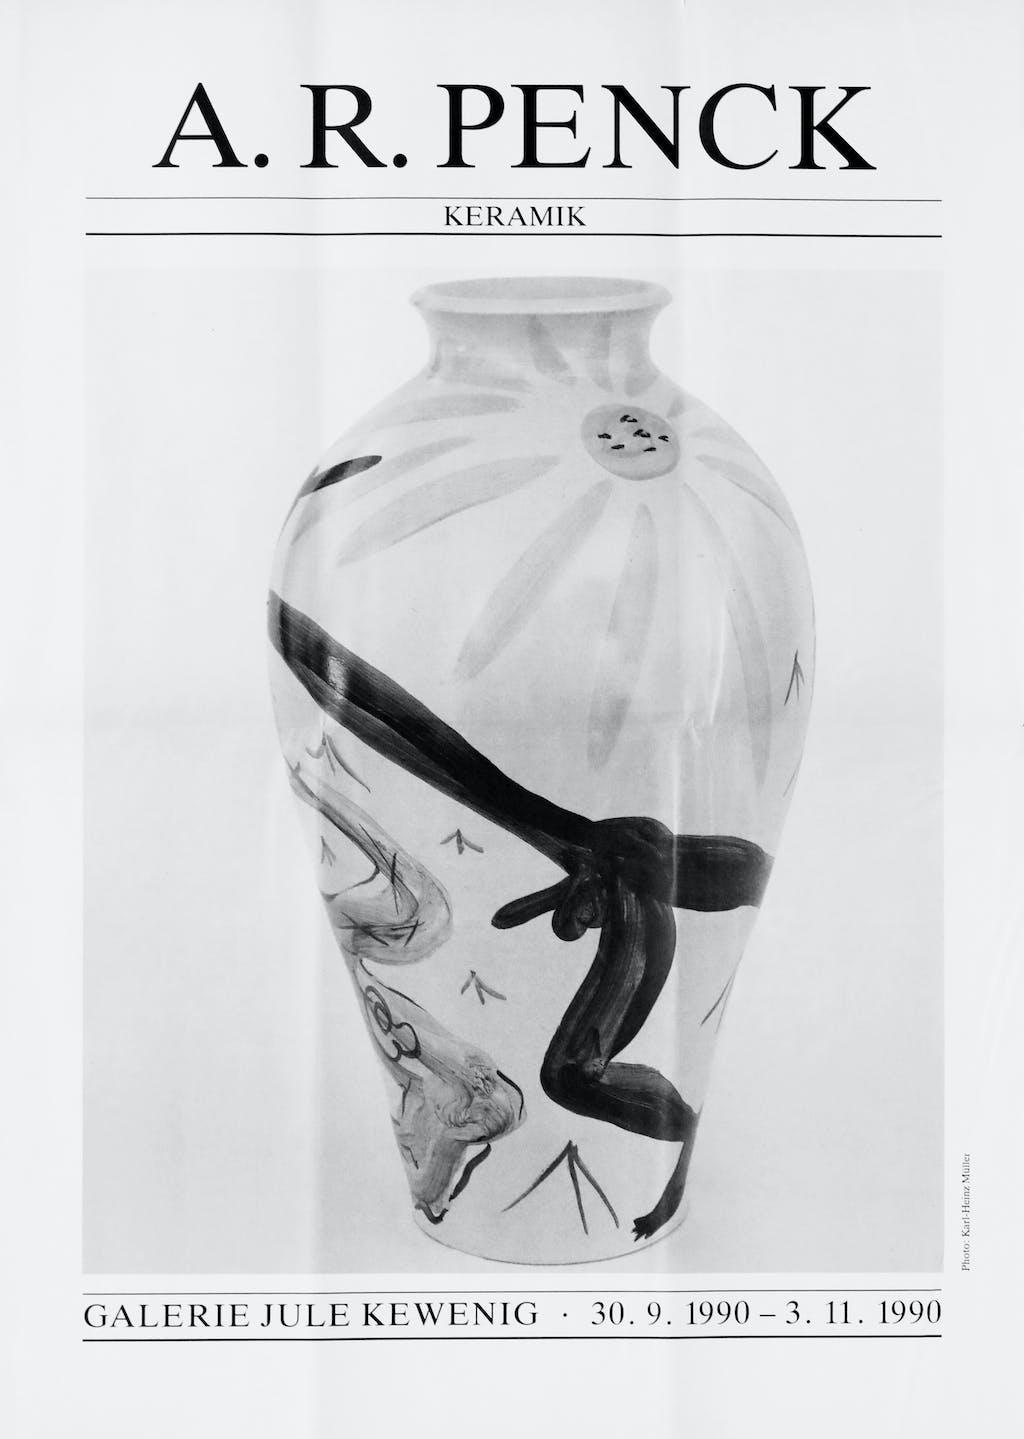 A. R. Penck, Keramik